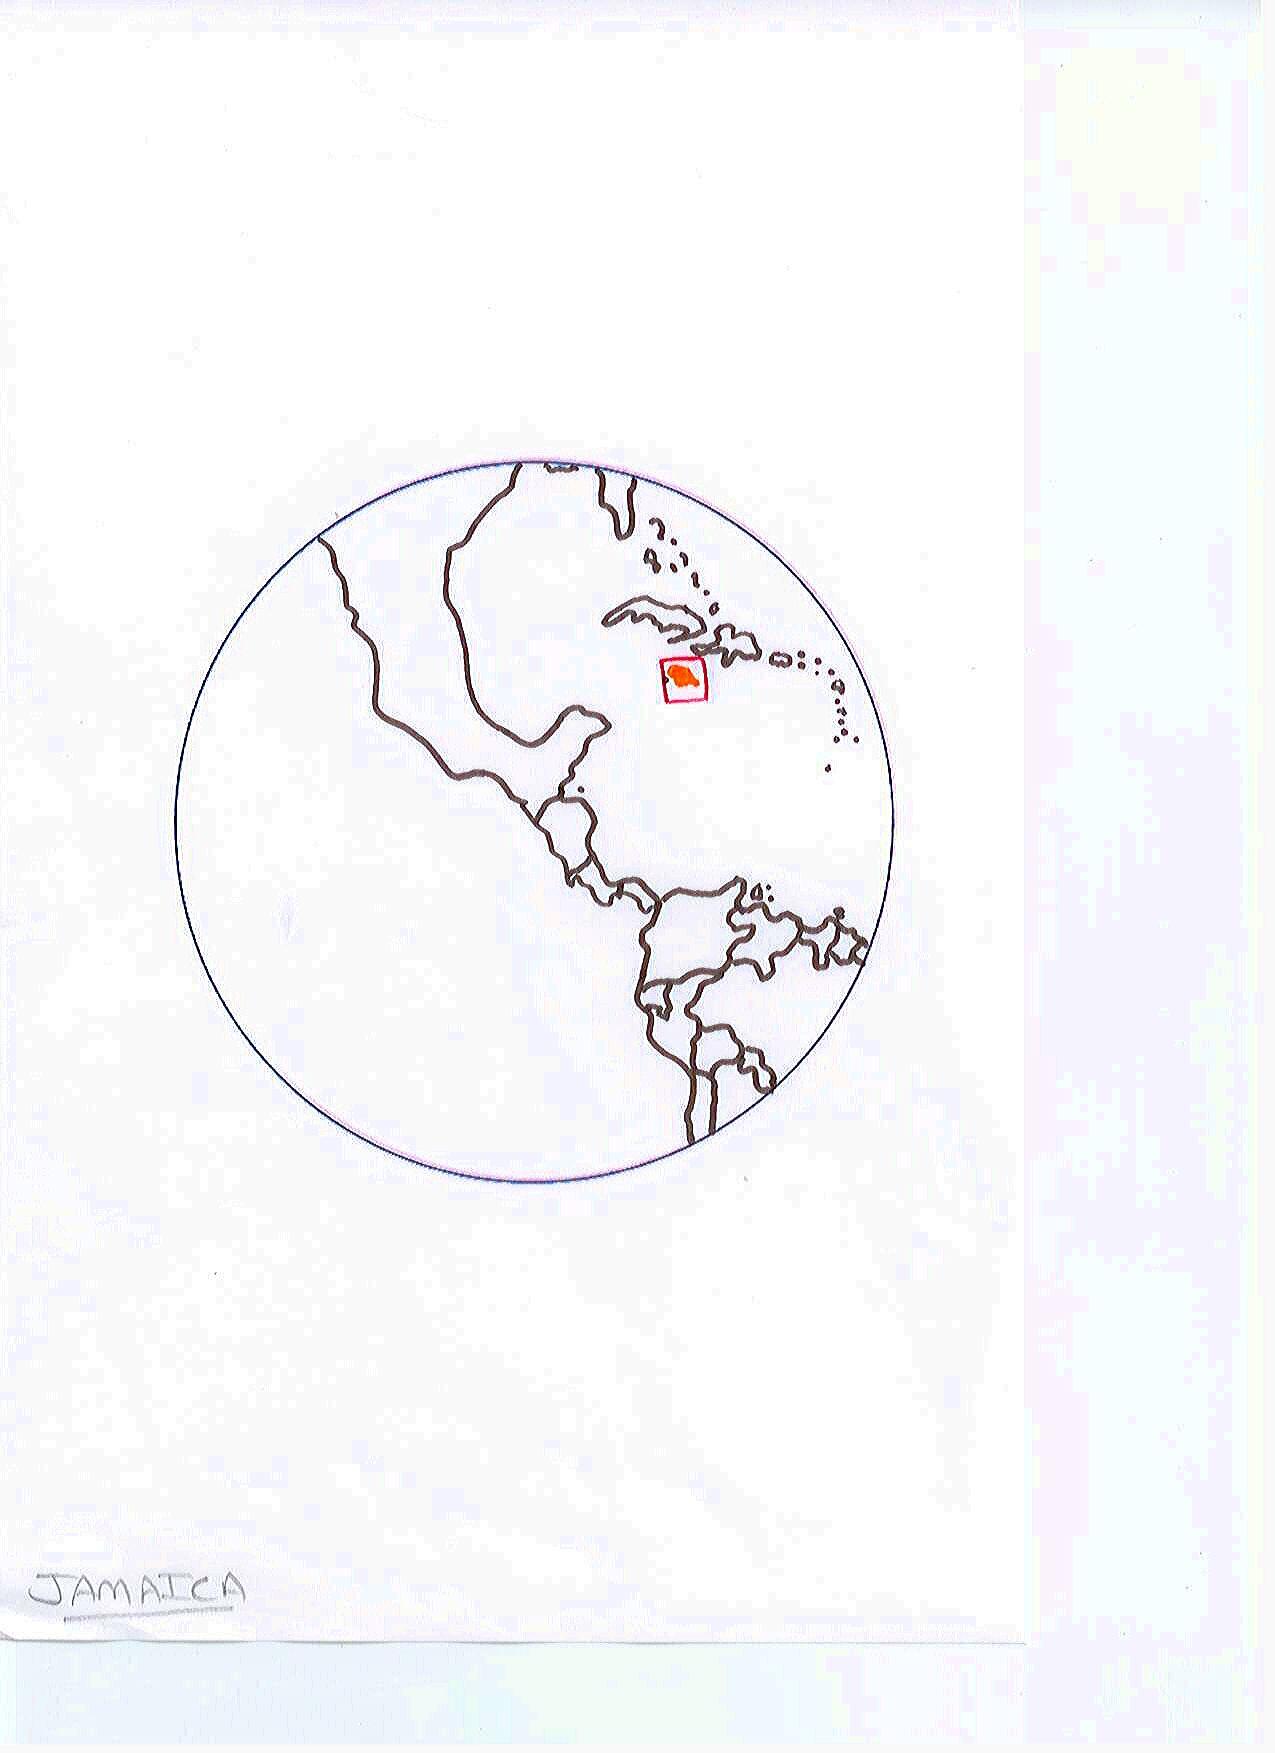 bauxite hindu personals Baghelkhand: baghelkhand, historical region, eastern madhya pradesh state,  deposits of coal, limestone, bauxite, clay, and quartzite are in the region,.